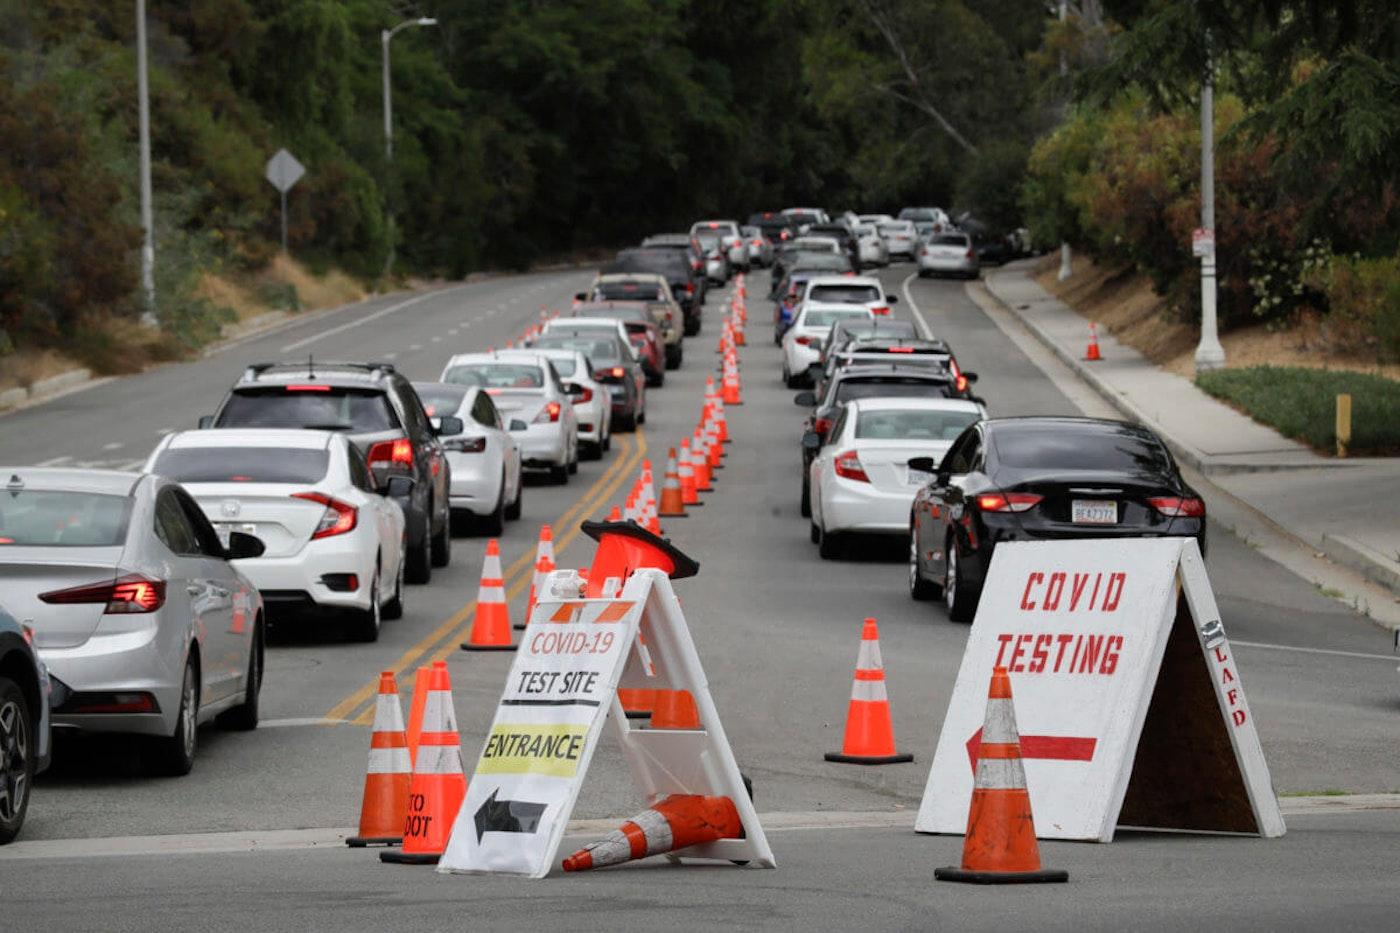 Motorists line up at a coronavirus testing site. (AP Photo/Marcio Jose Sanchez)